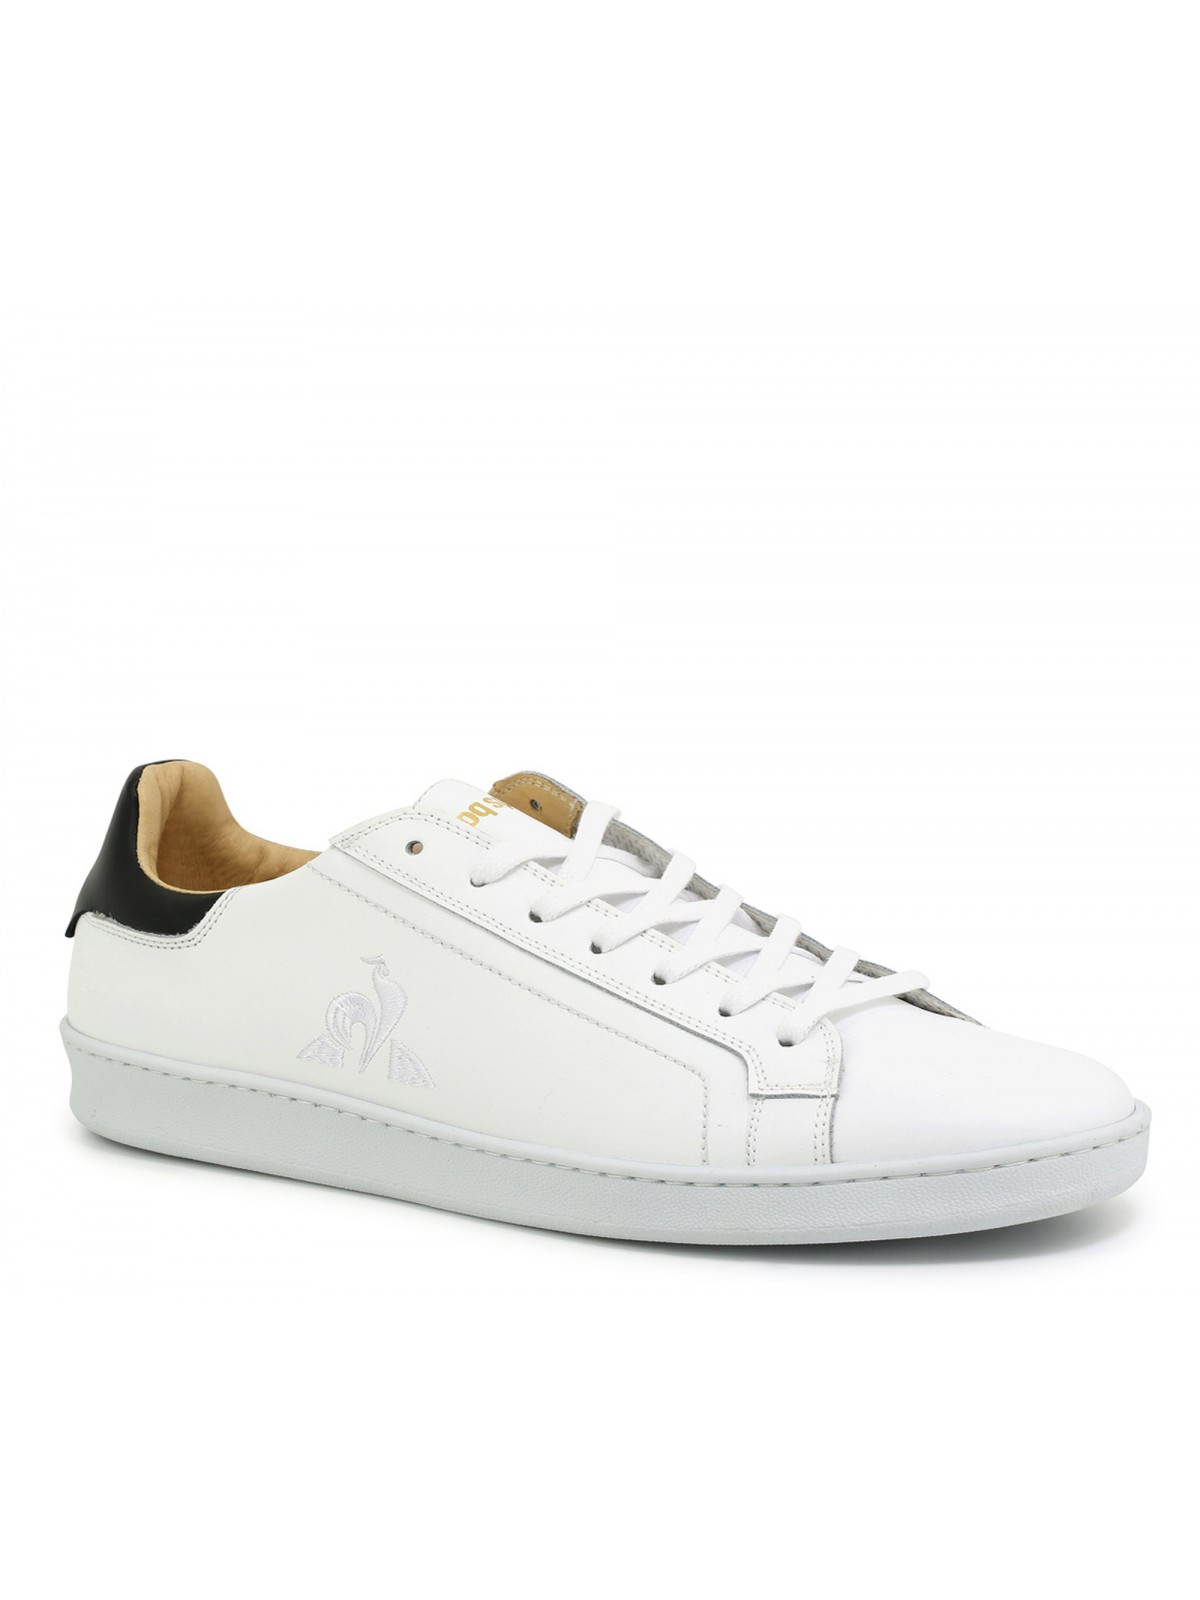 Le Coq Sportif Avantage cuir blanc